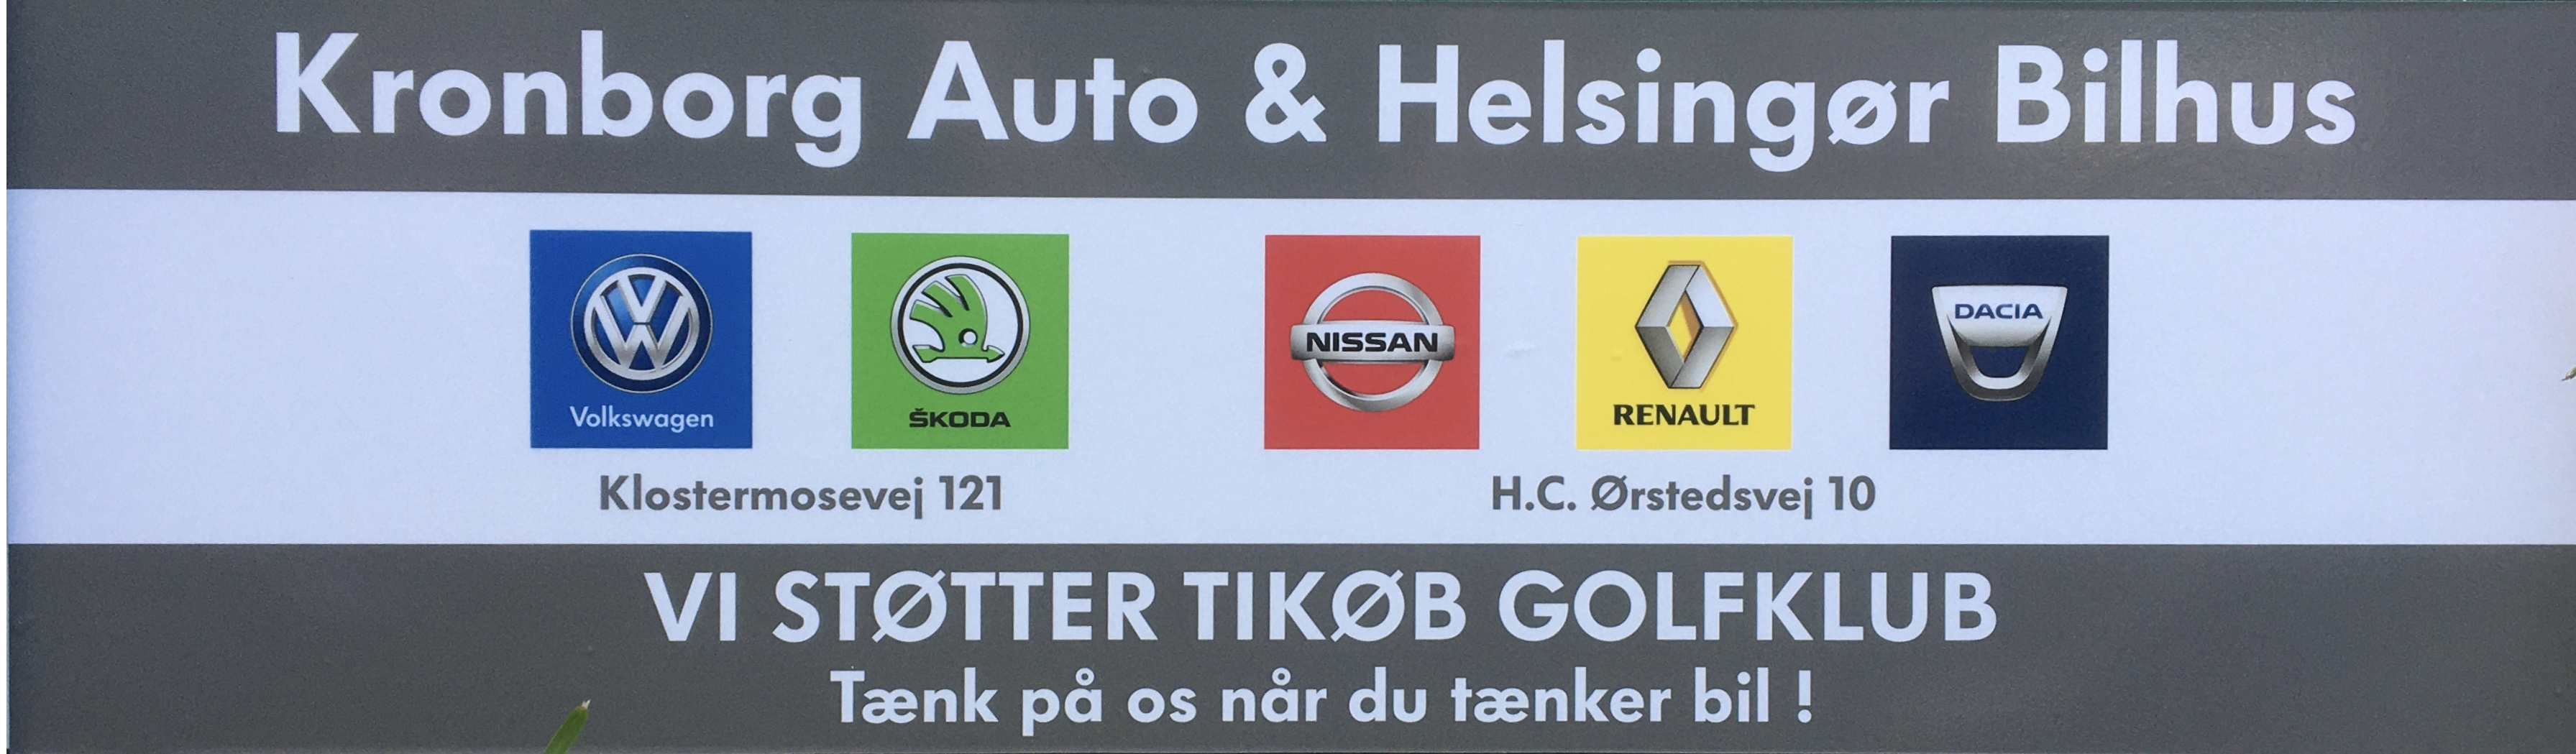 Kronborg Auto & Helsingør Bilhus A/S